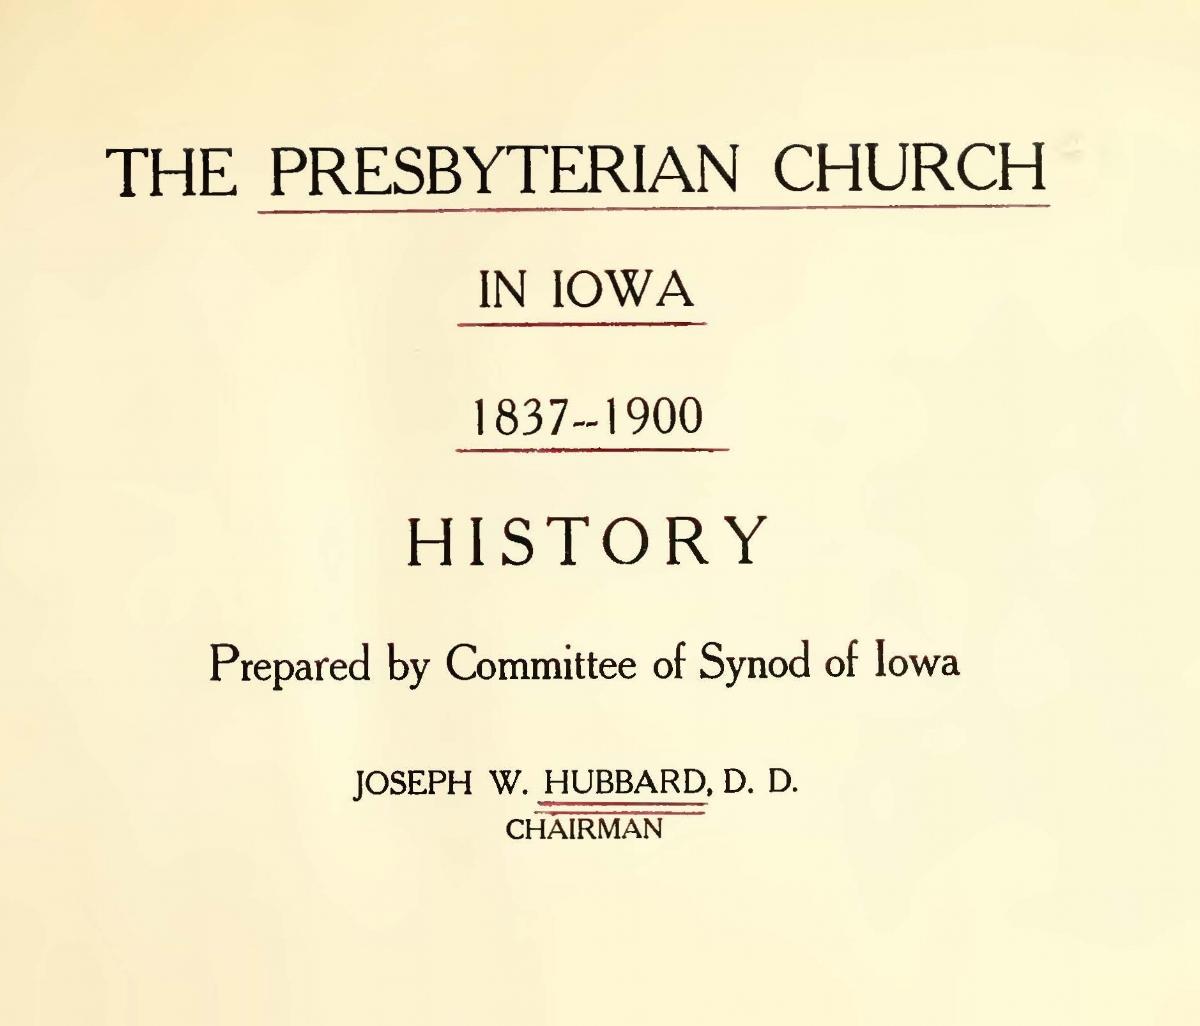 Hubbard, Joseph Welton, The Presbyterian Church in Iowa, 1837-1900 Title Page.jpg